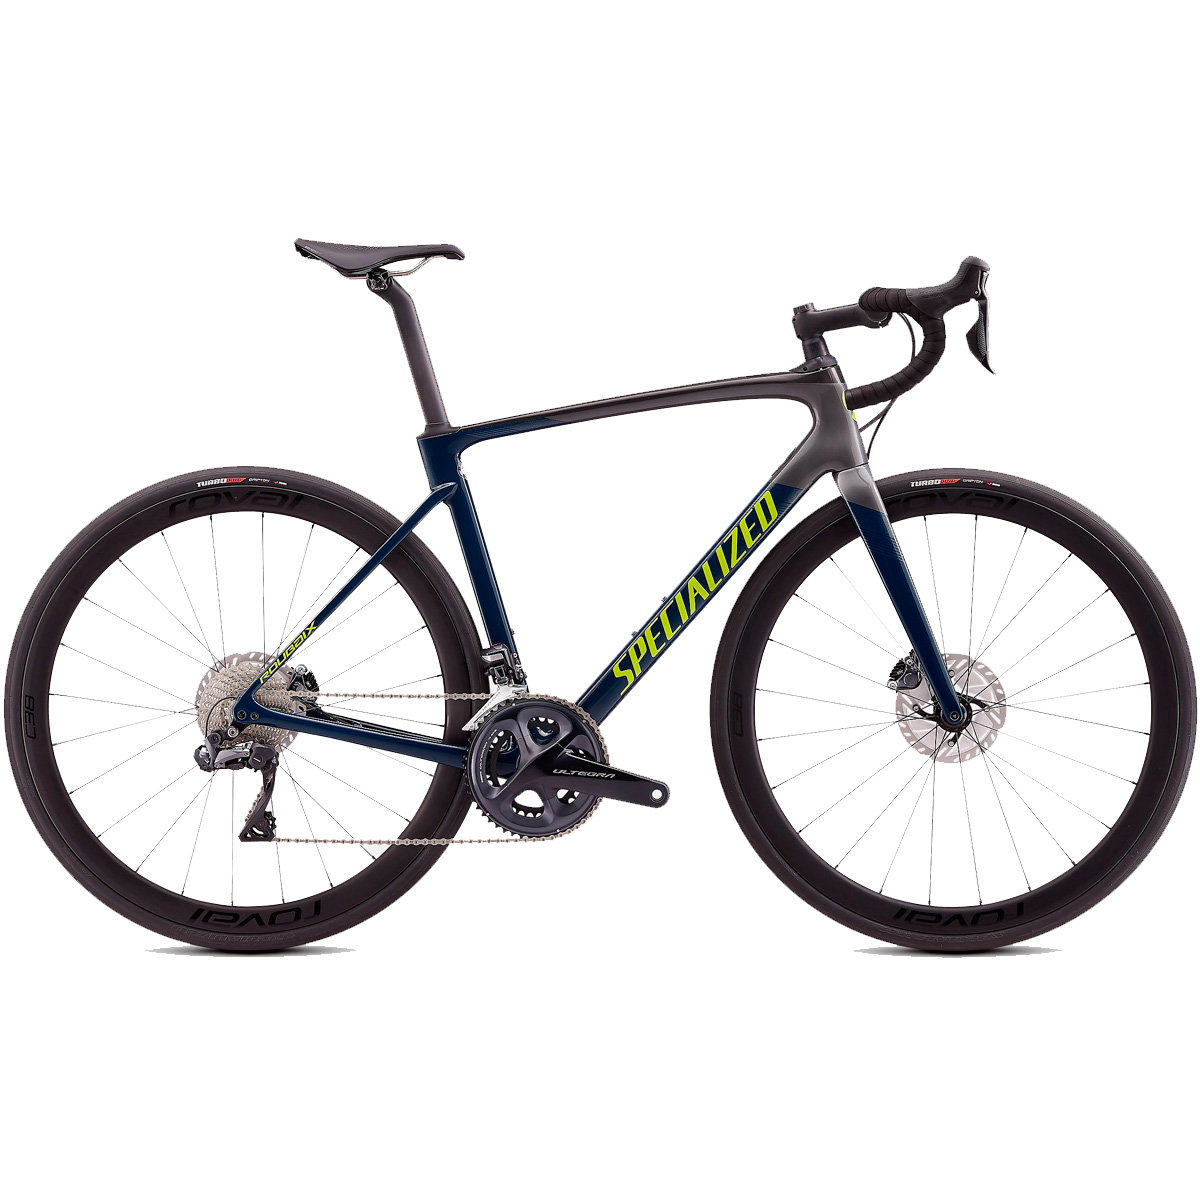 Bicicleta Specialized Roubaix Expert